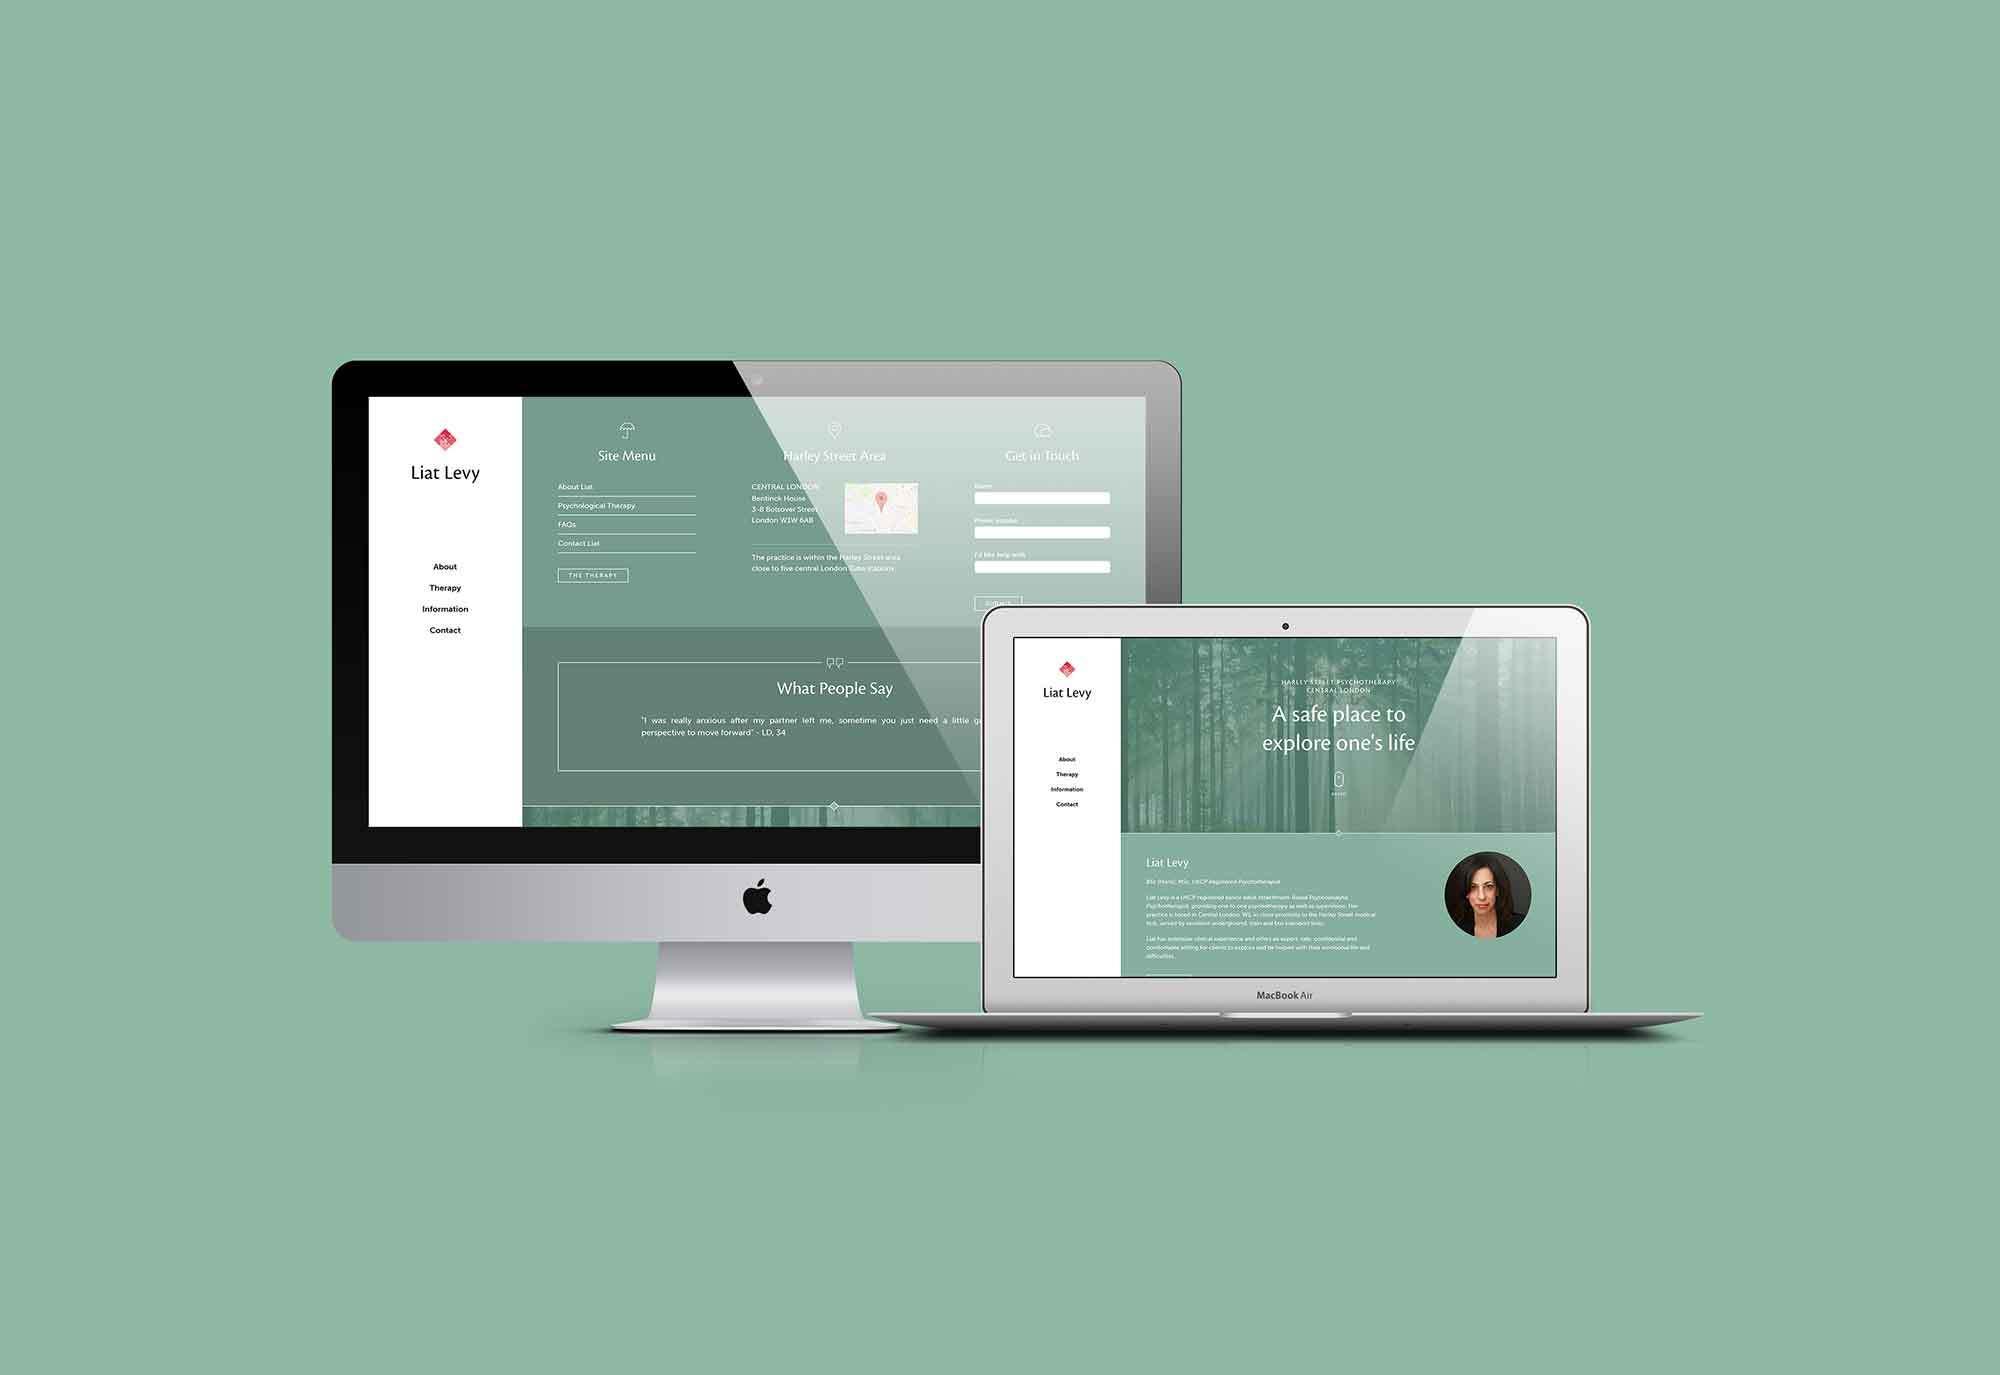 Liat Levy Desktop